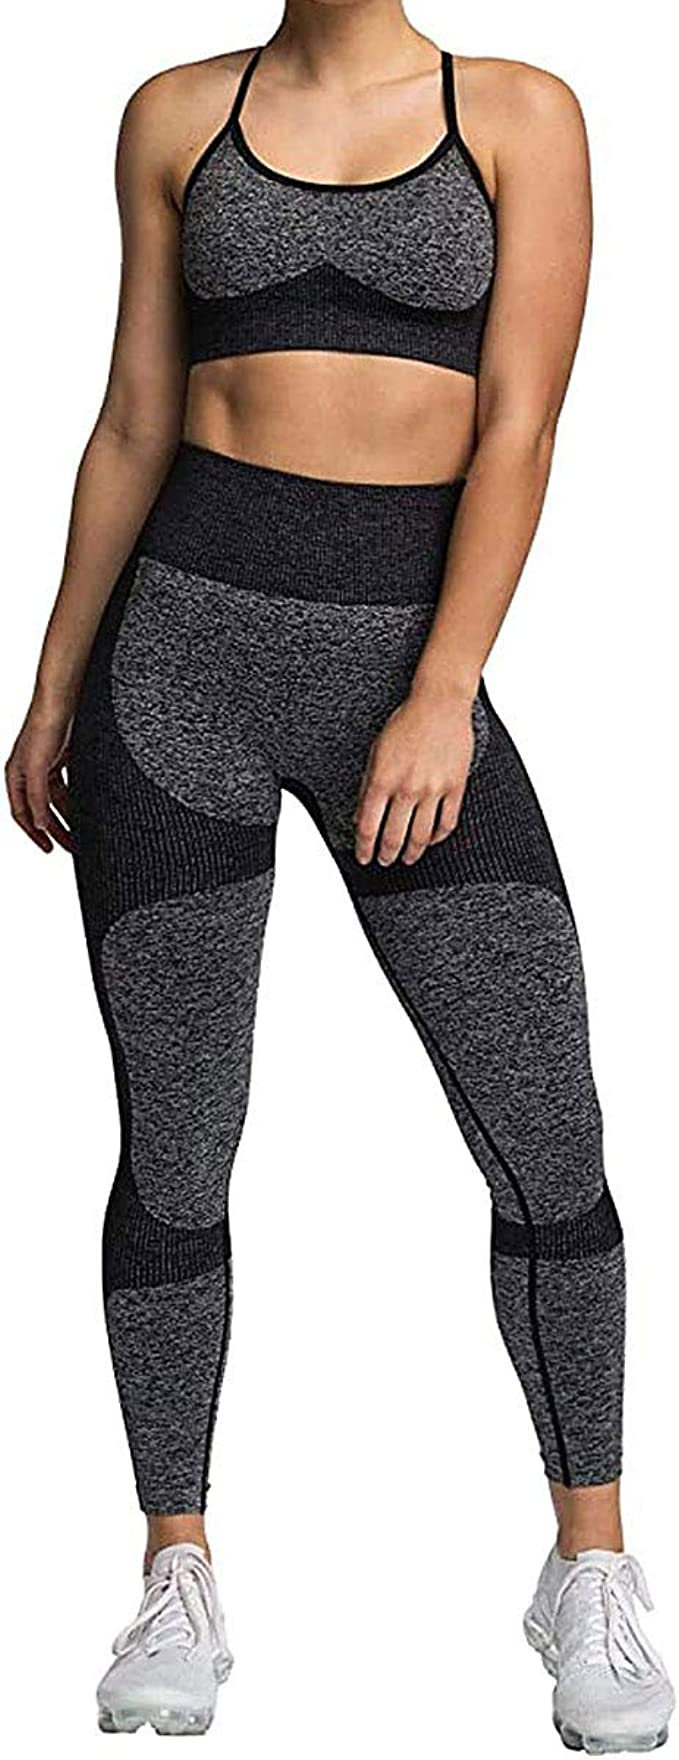 Geagodelia Damen Yoga Trainingsanzug Workout Outfit Bunt Blumen 2 Teilig Yoga Leggings High Waist /Ärmellos Crop Top Sport BH Fitness Kleidung Set f/ür Gym Zumba Pilates